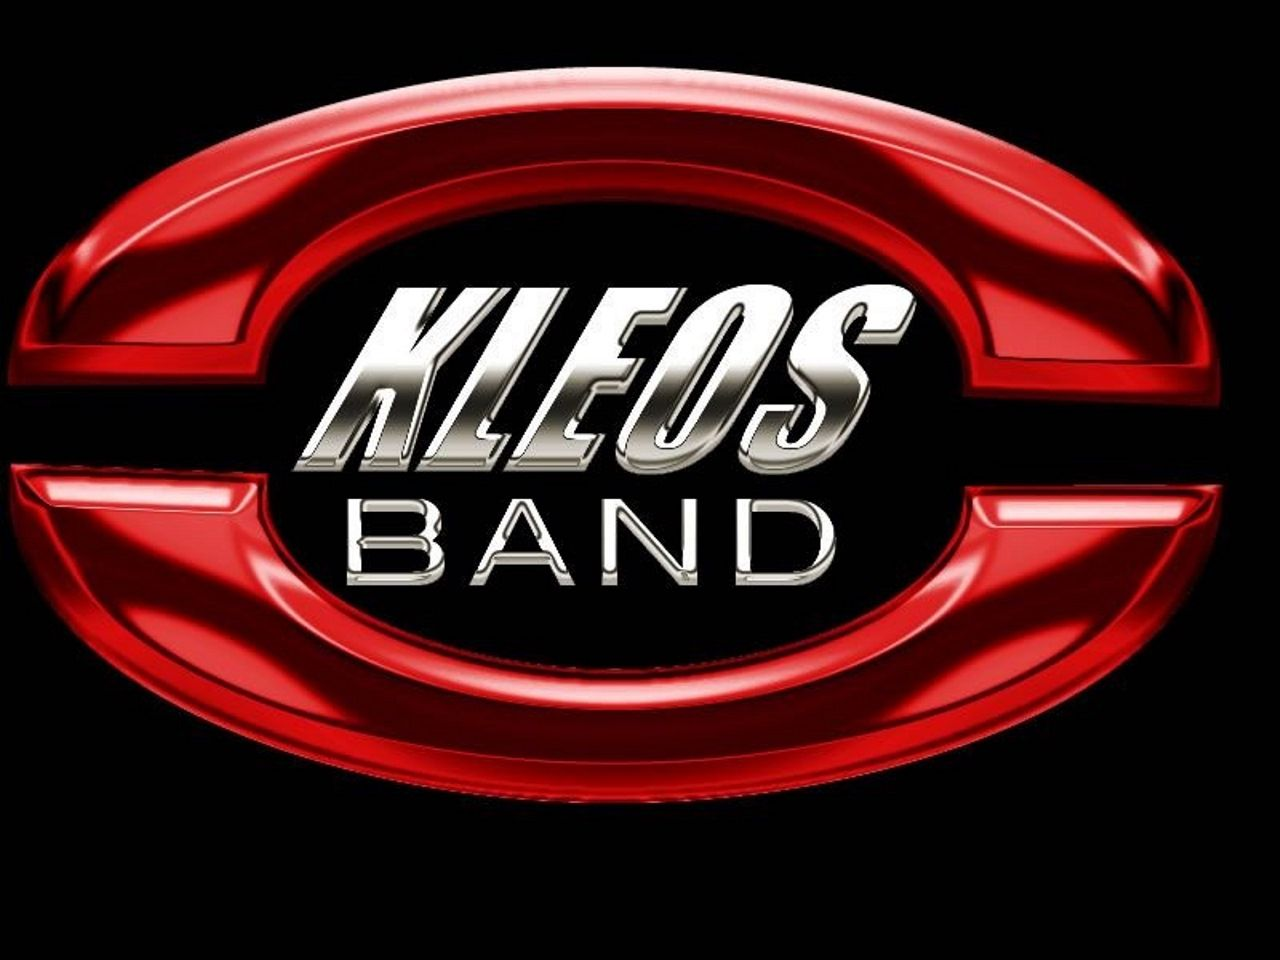 Kleos Band